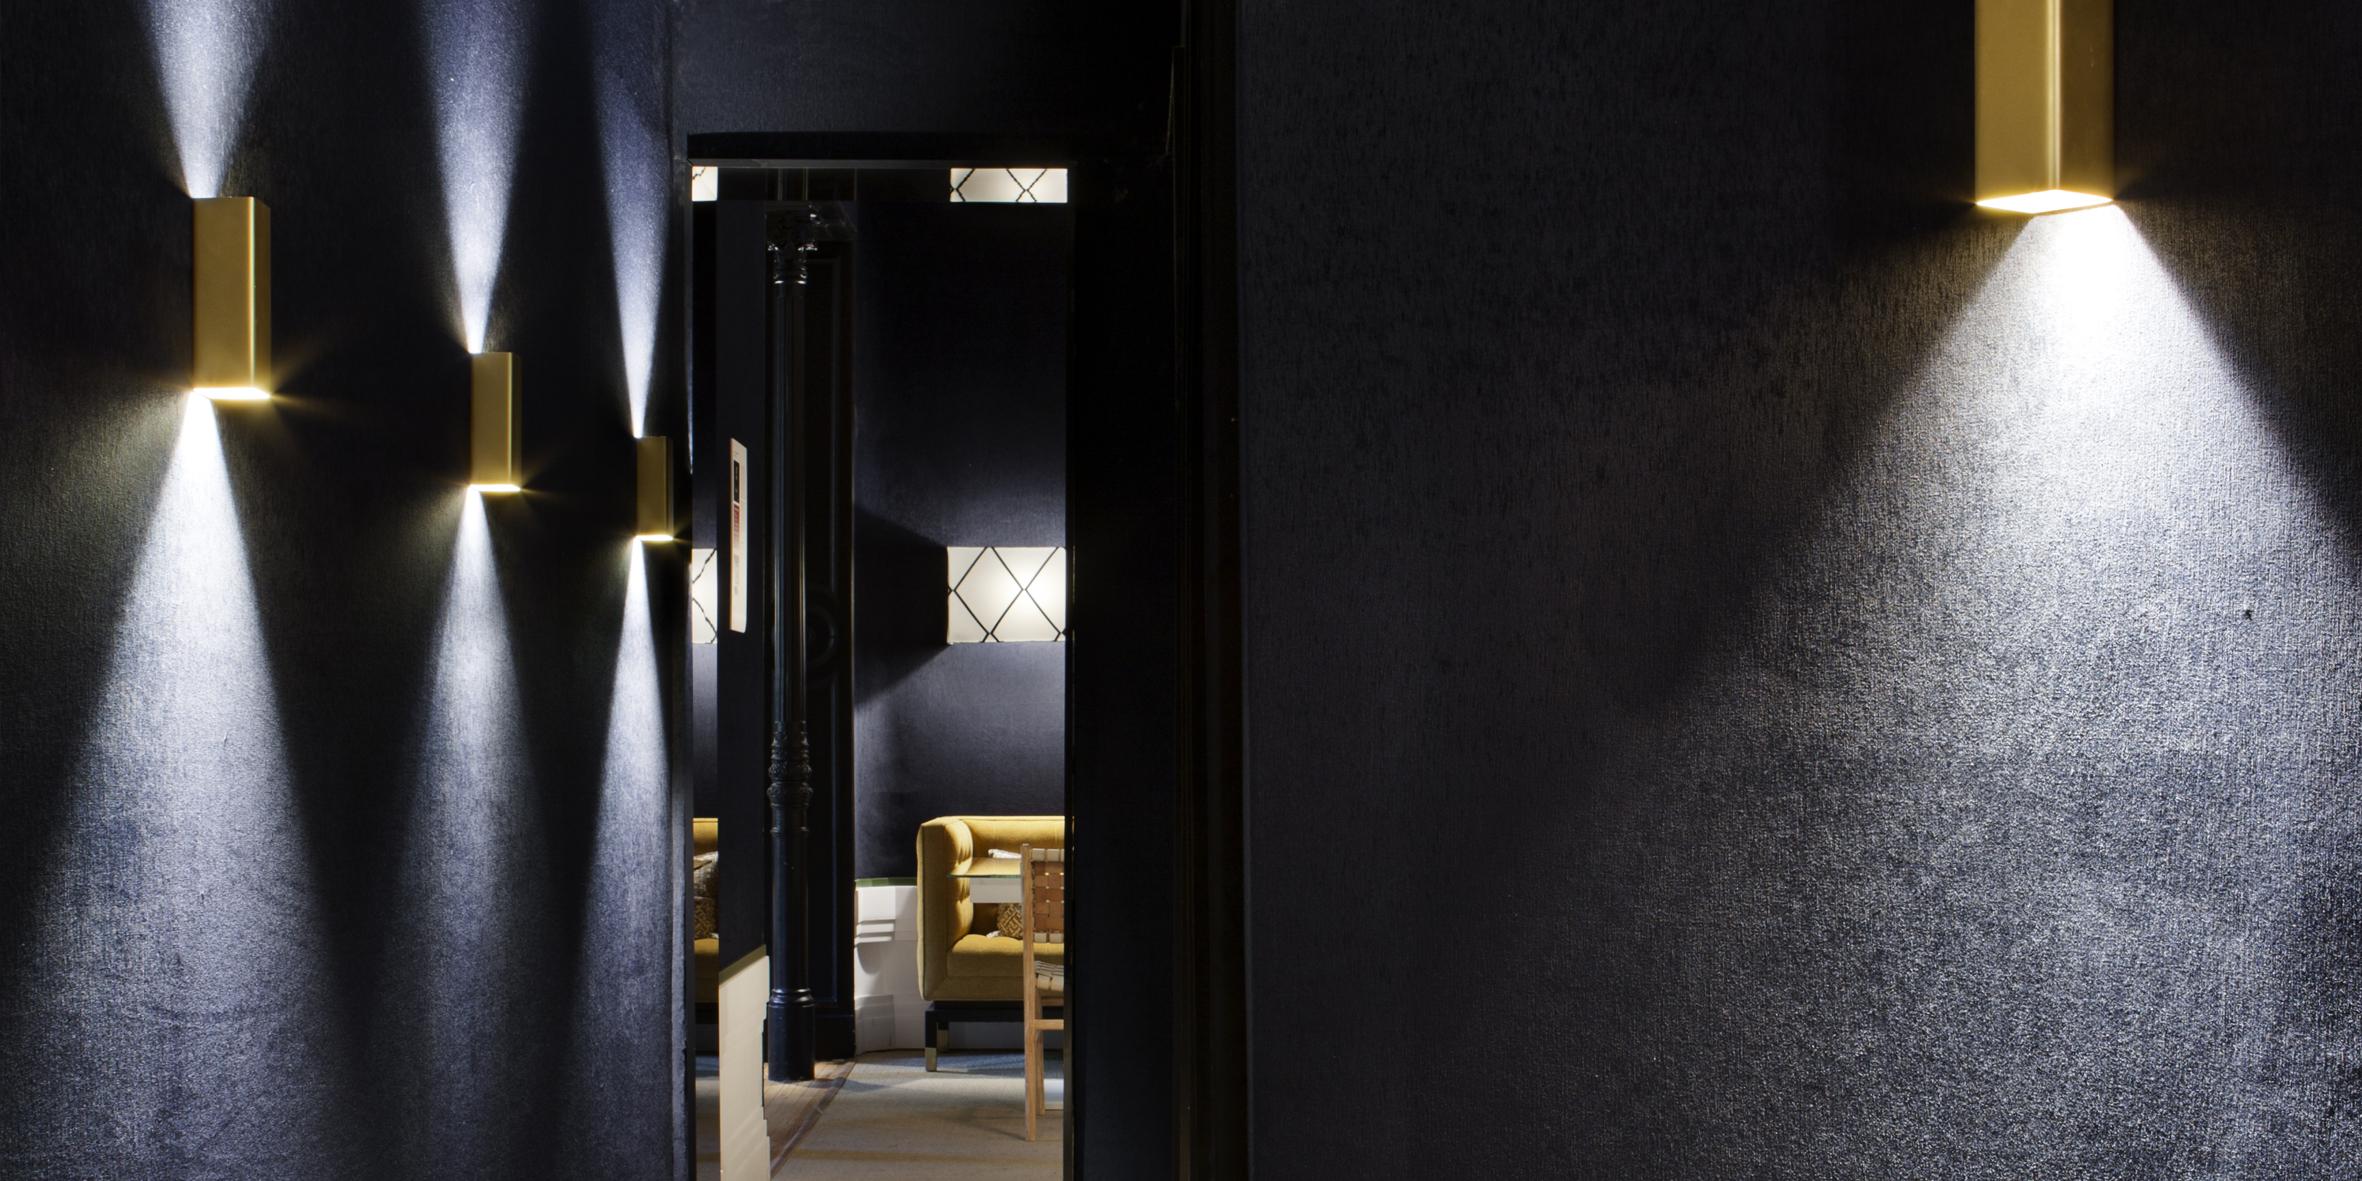 RESTAURANTE DE MODA RESTAURANTE DISEÑO RESTAURANTE ELEGANTE RESTAURANTE MODERNO HOTEL BOUTIQUE HOTEL